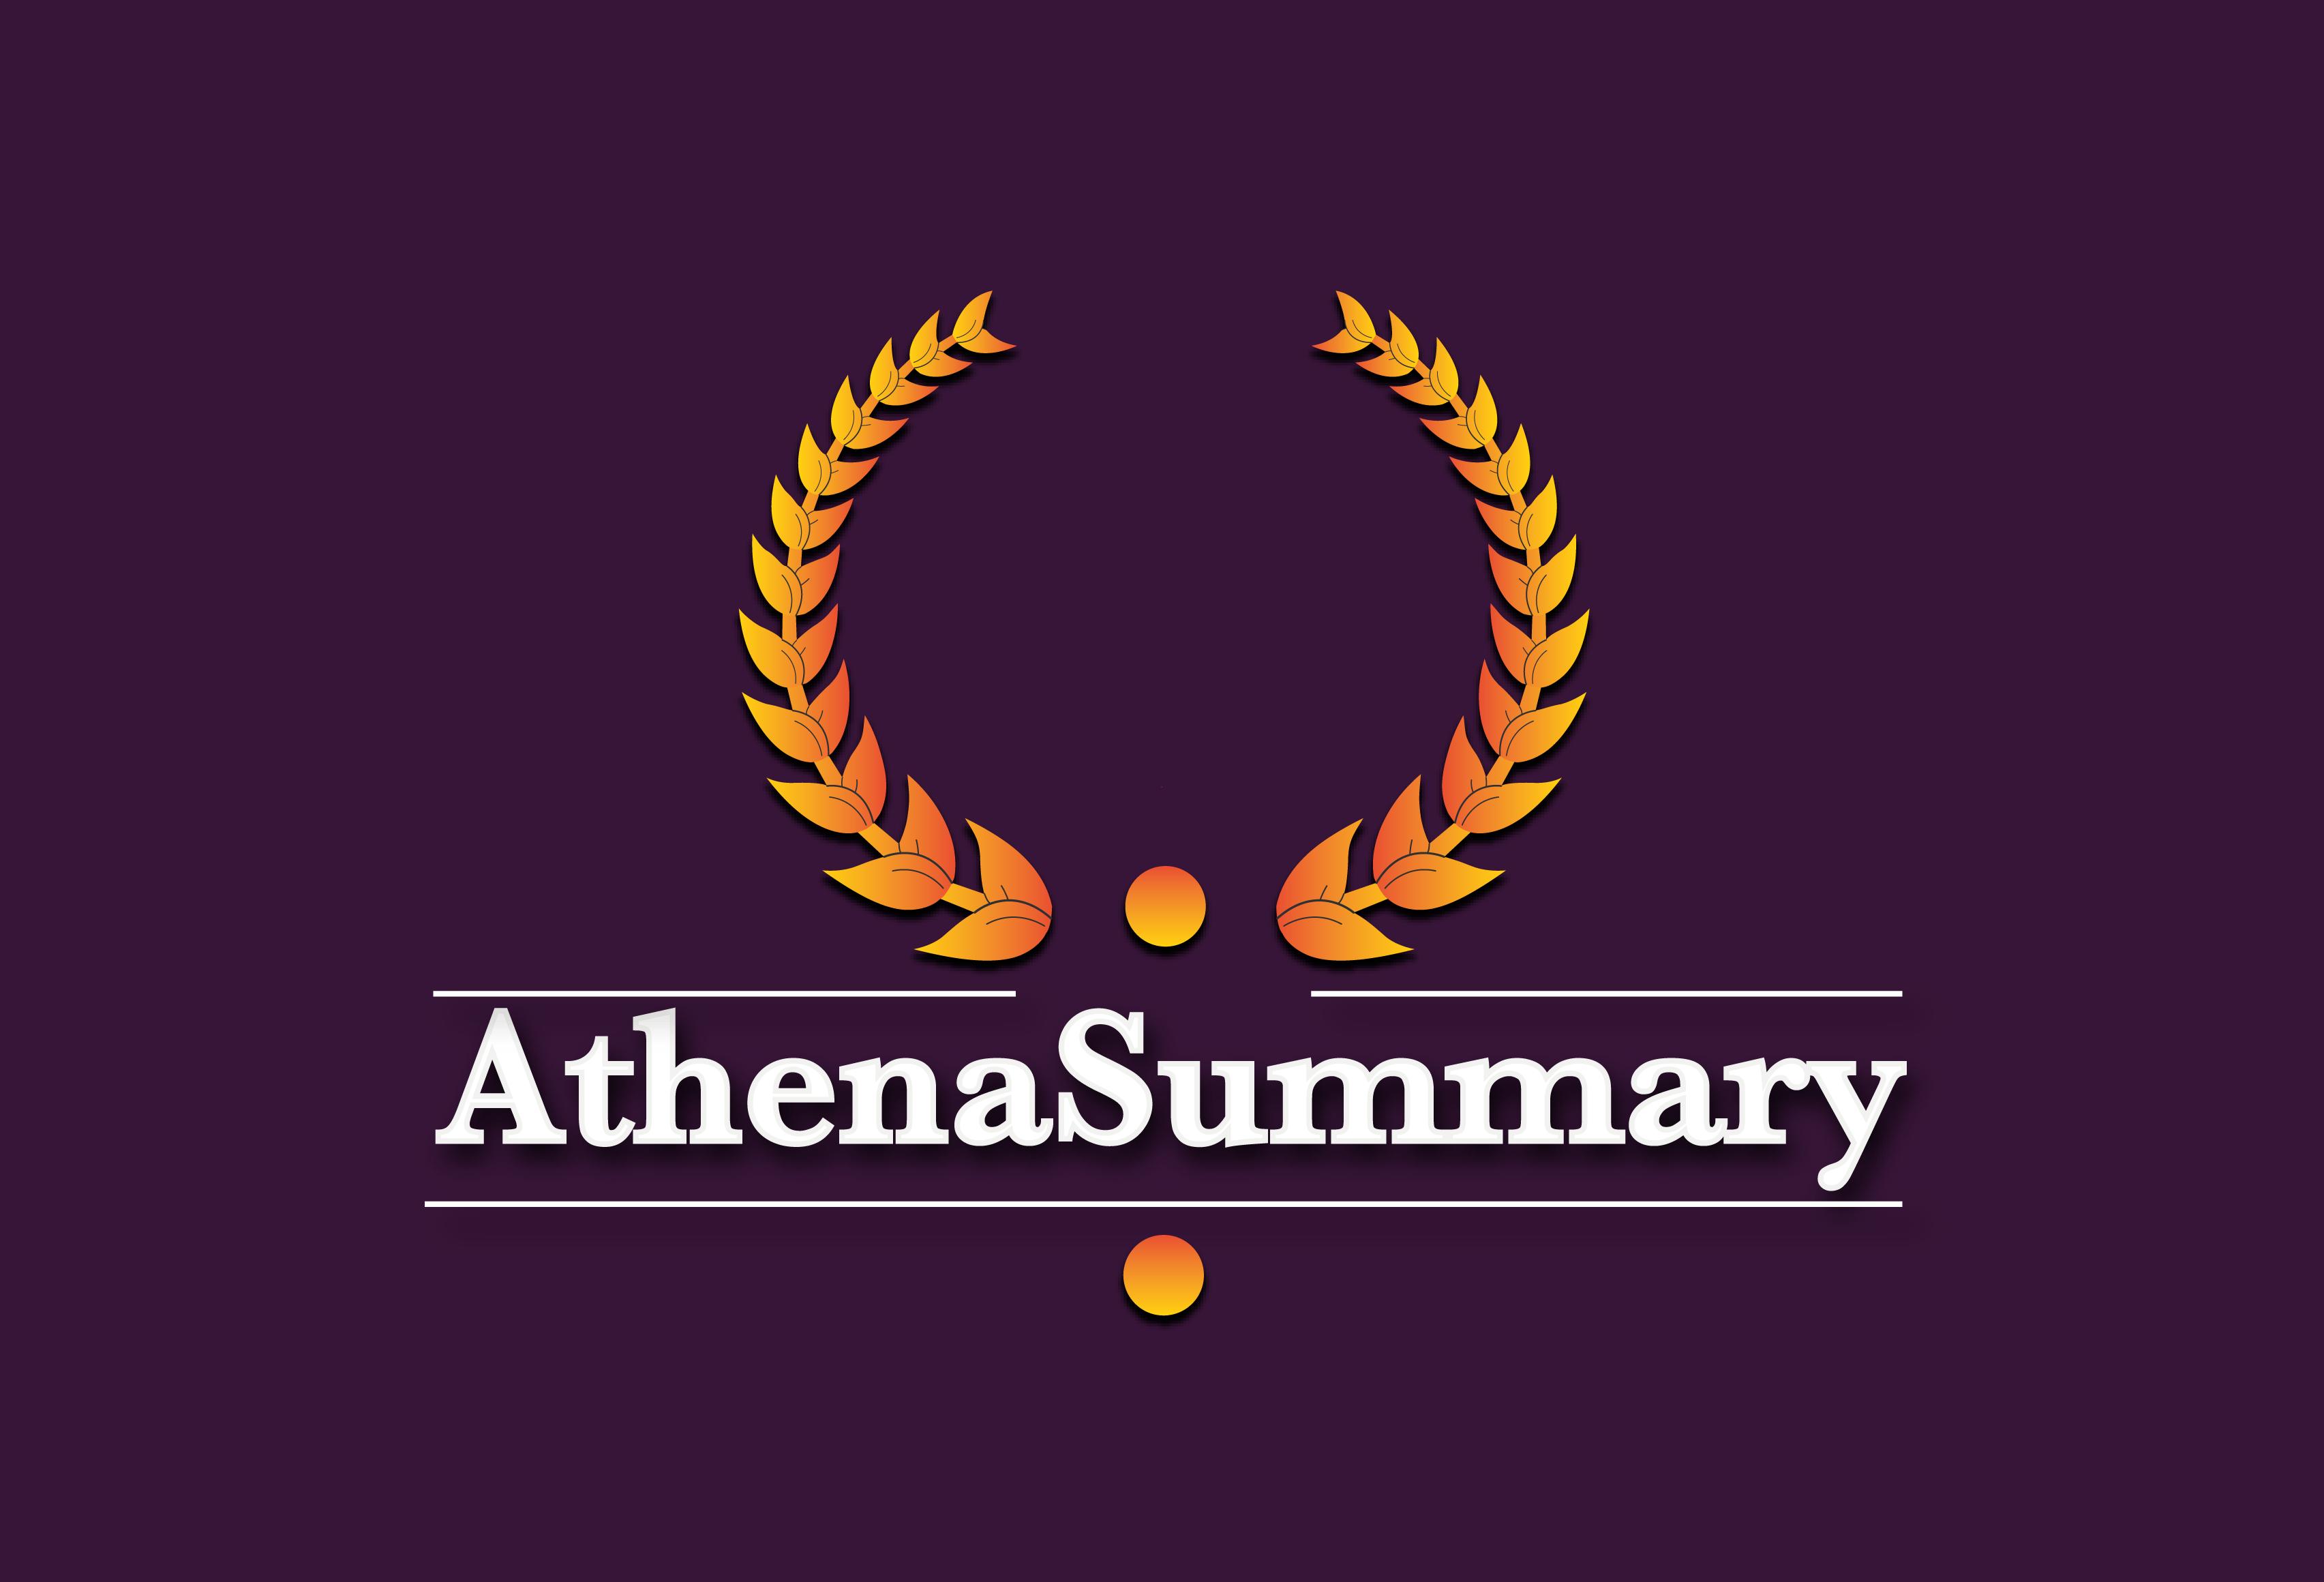 AthenaSummary.jpg